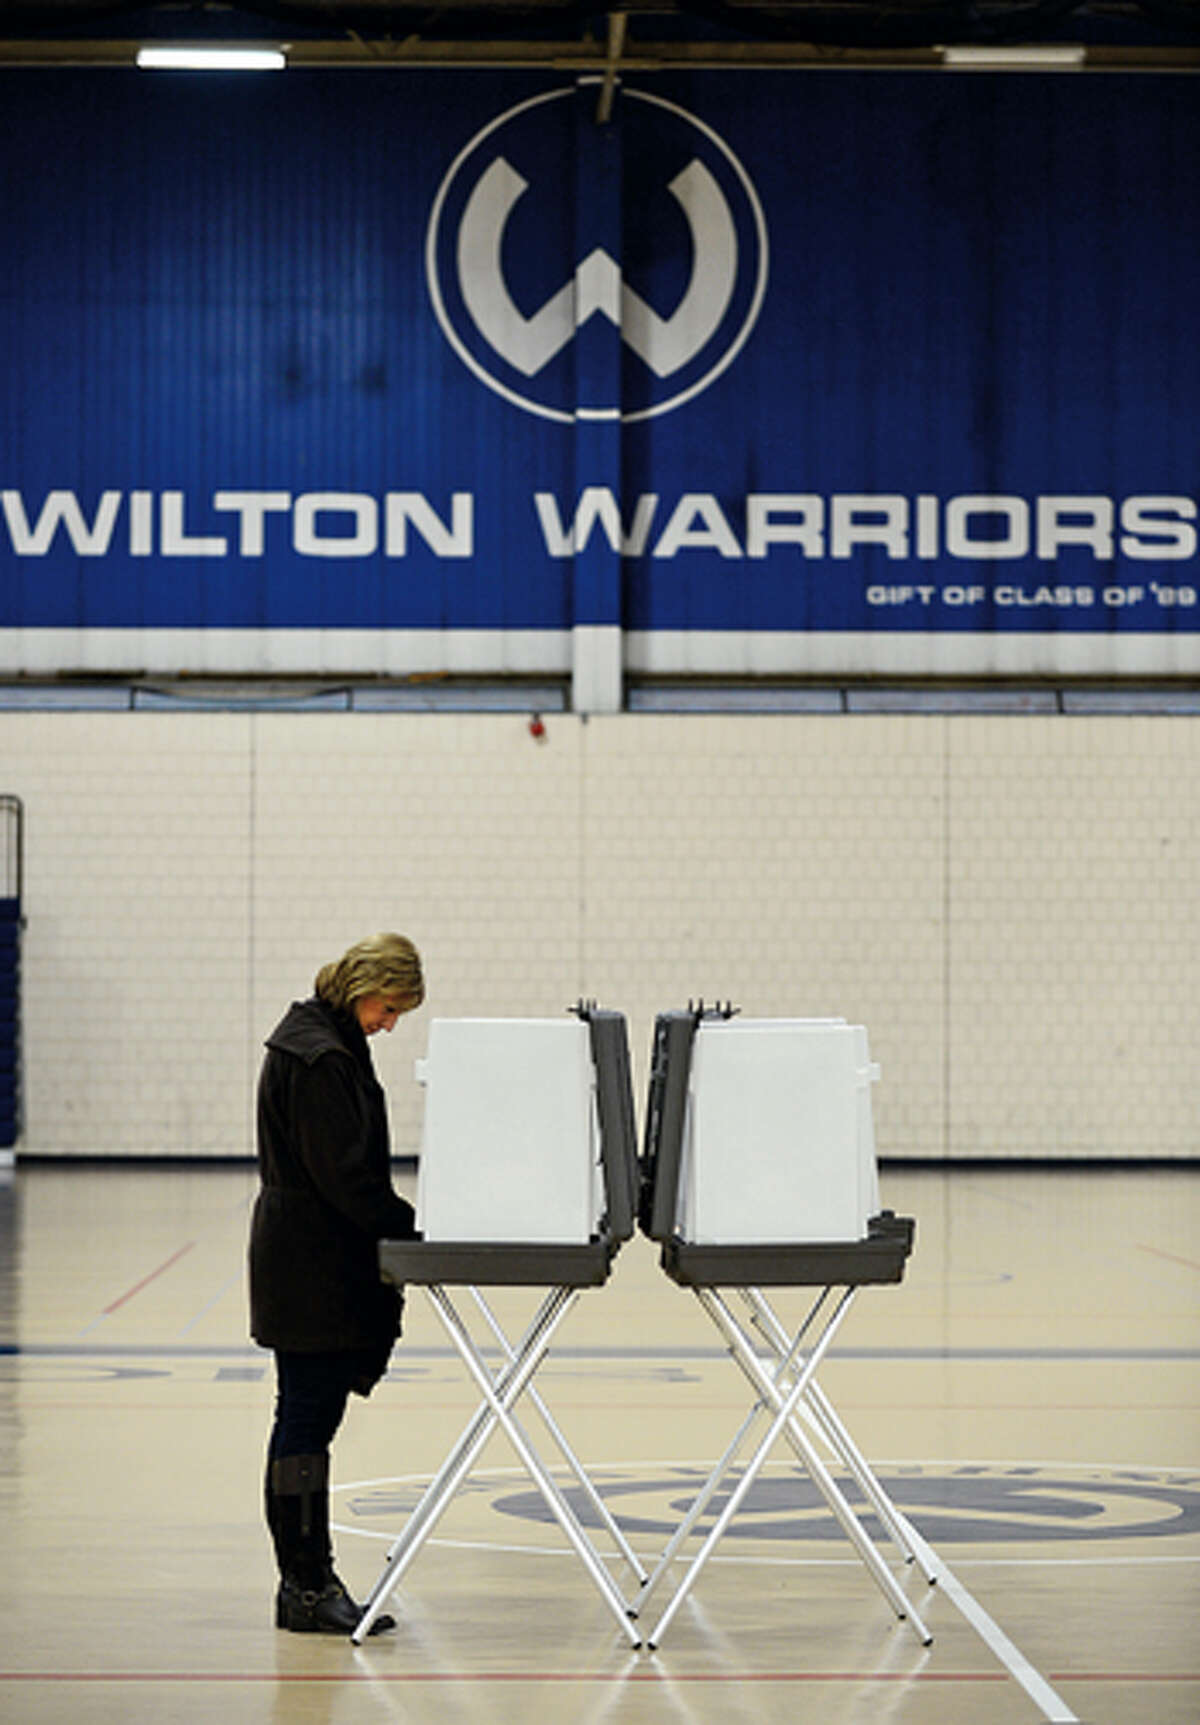 Wilton resident Debbie Ehrentreau cast her ballot at Wilton High School Tuesday. Hour photo / Erik Trautmann